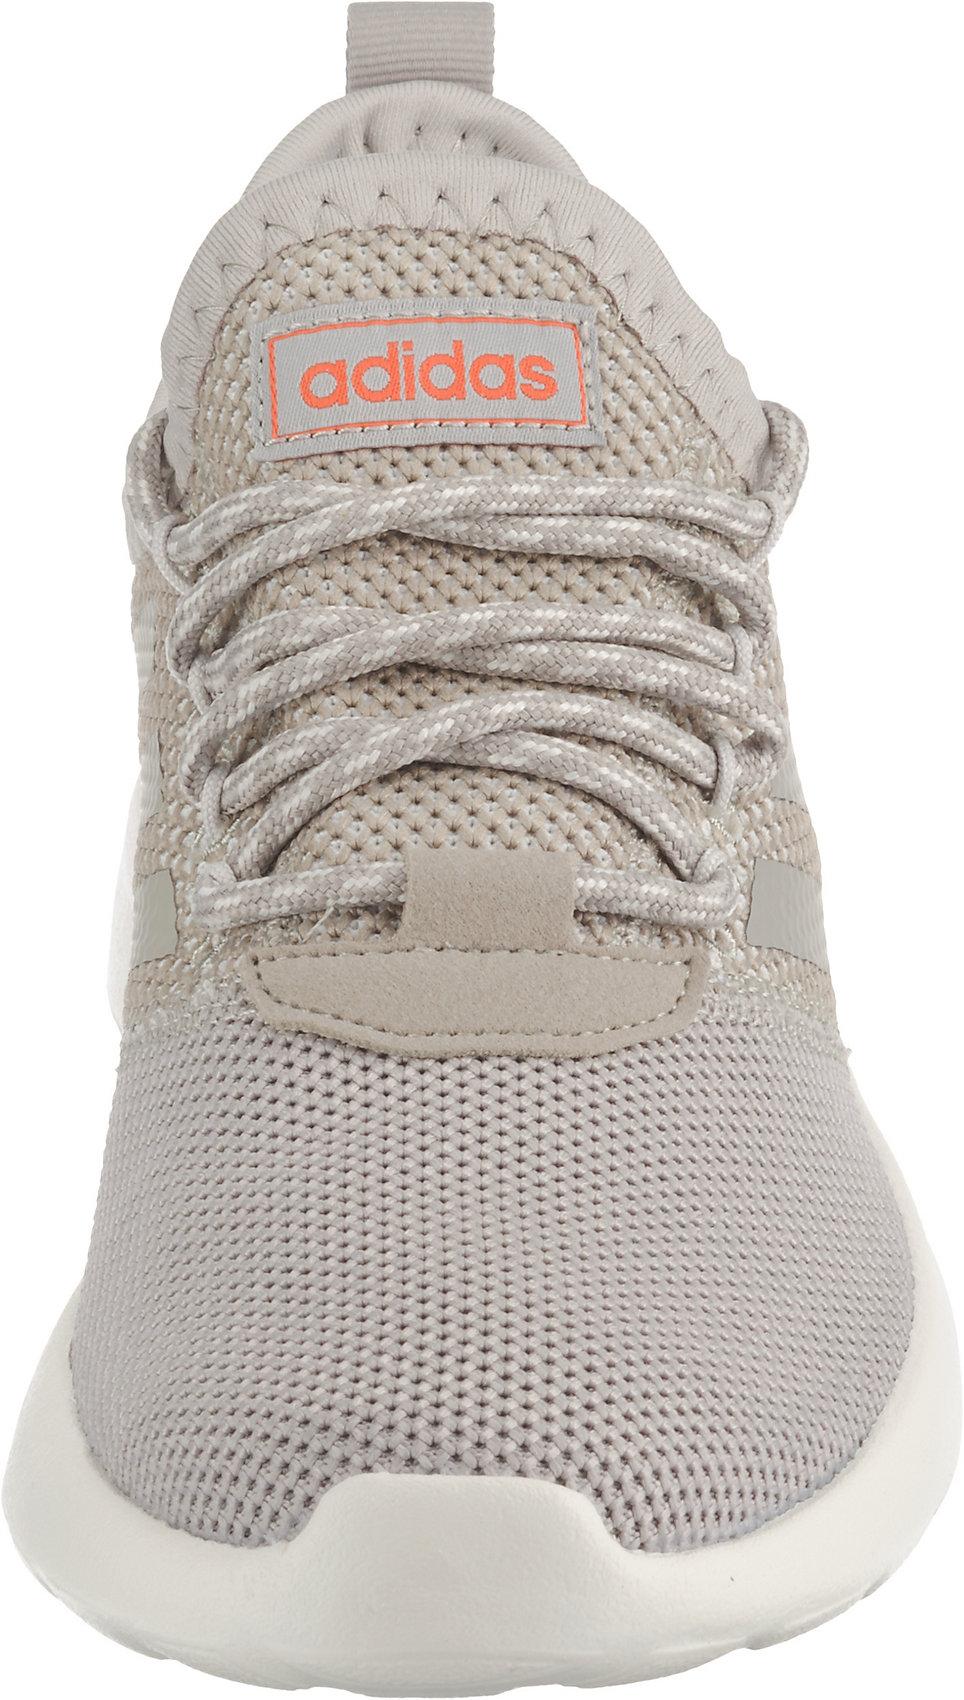 adidas Sport Inspired, Lite Racer Rbn Sneakers Low, weiß